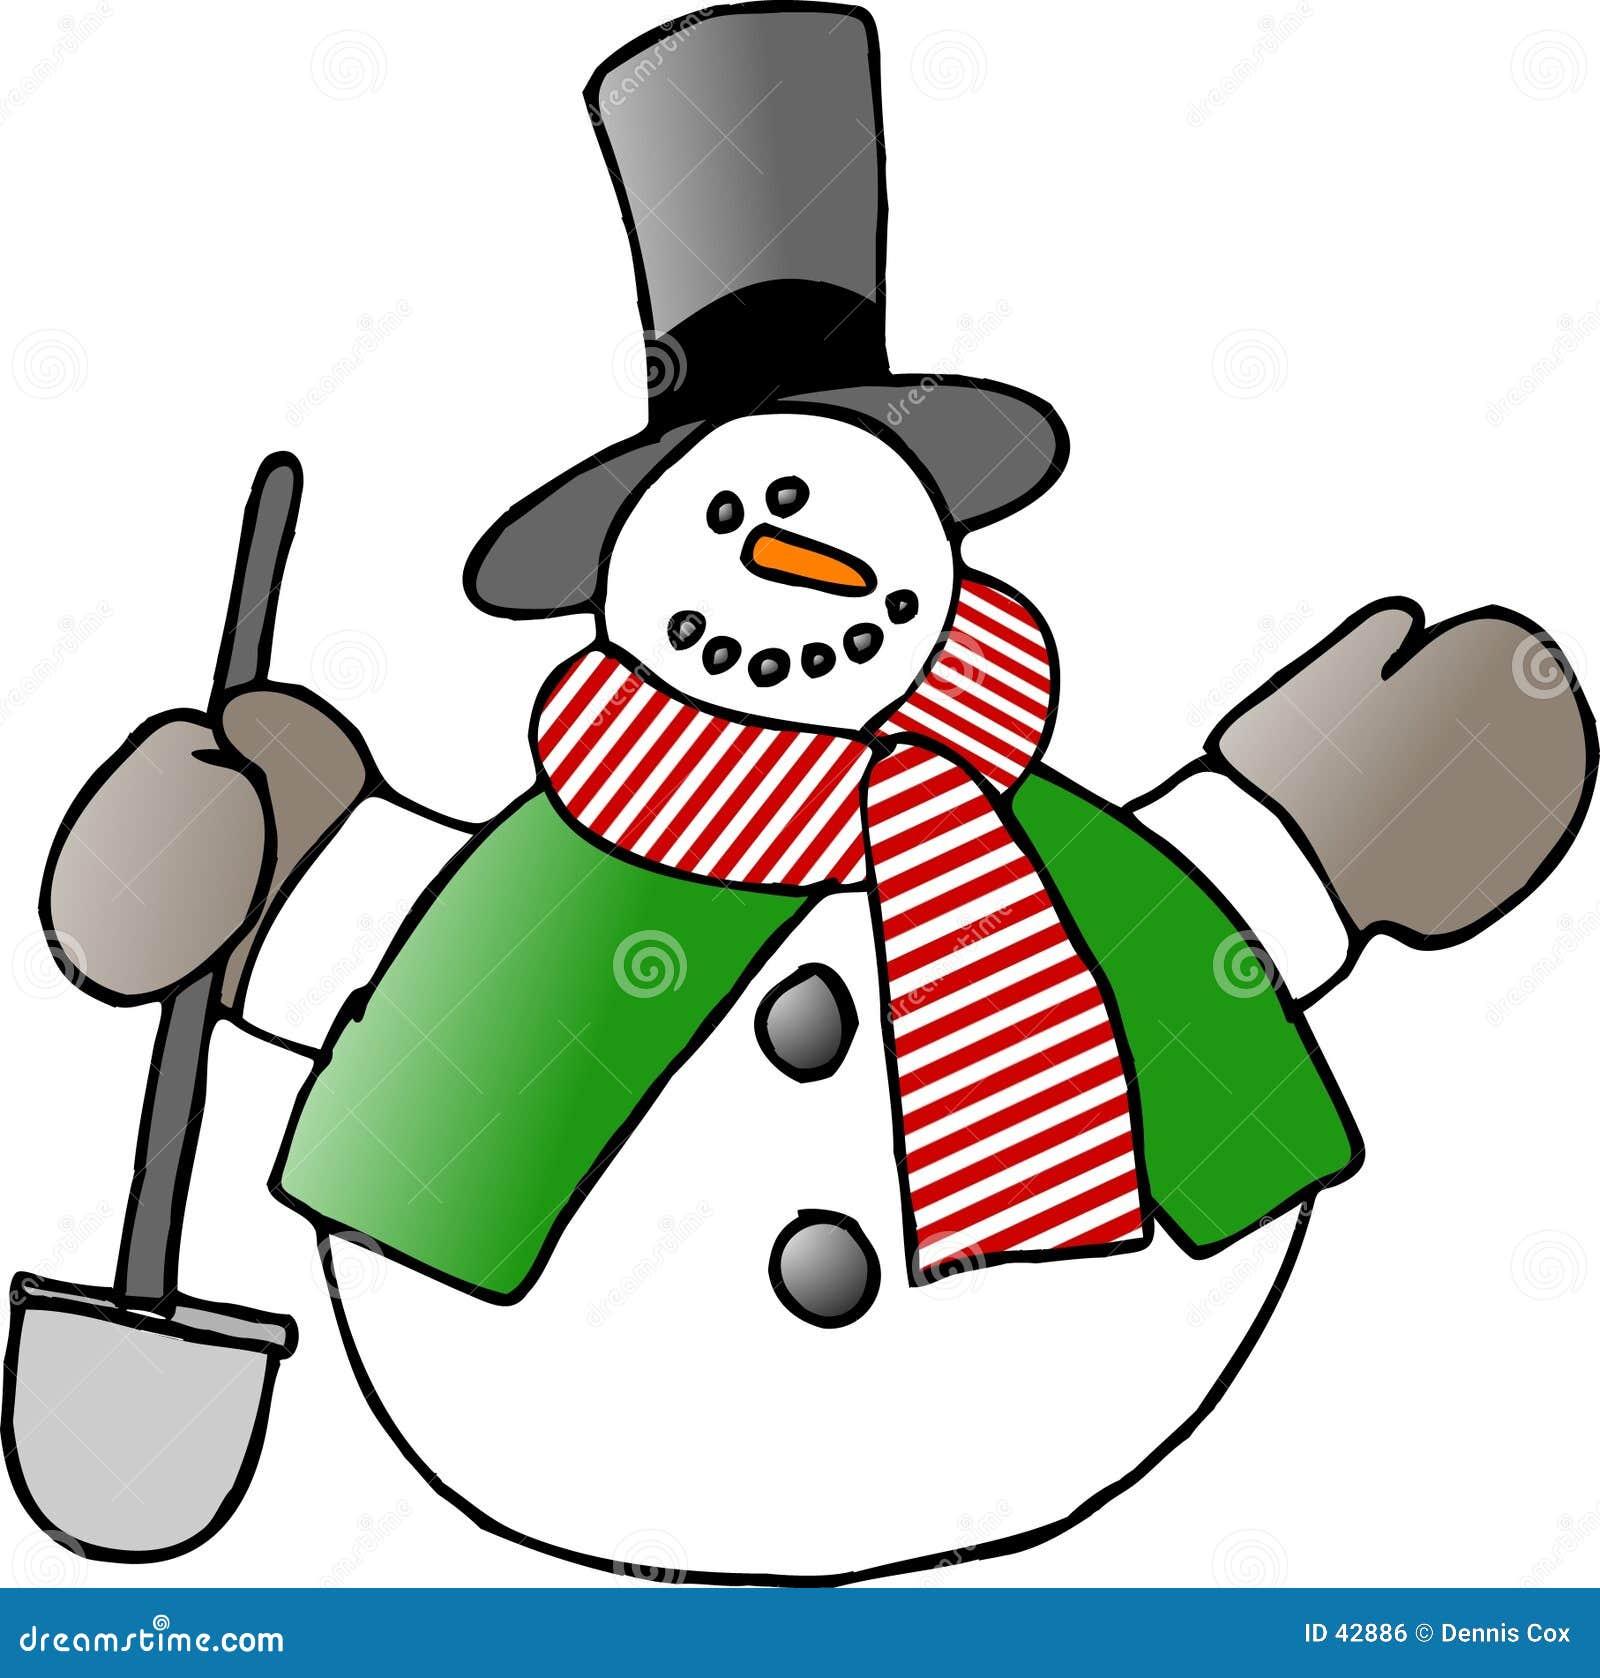 Snowman with a shovel